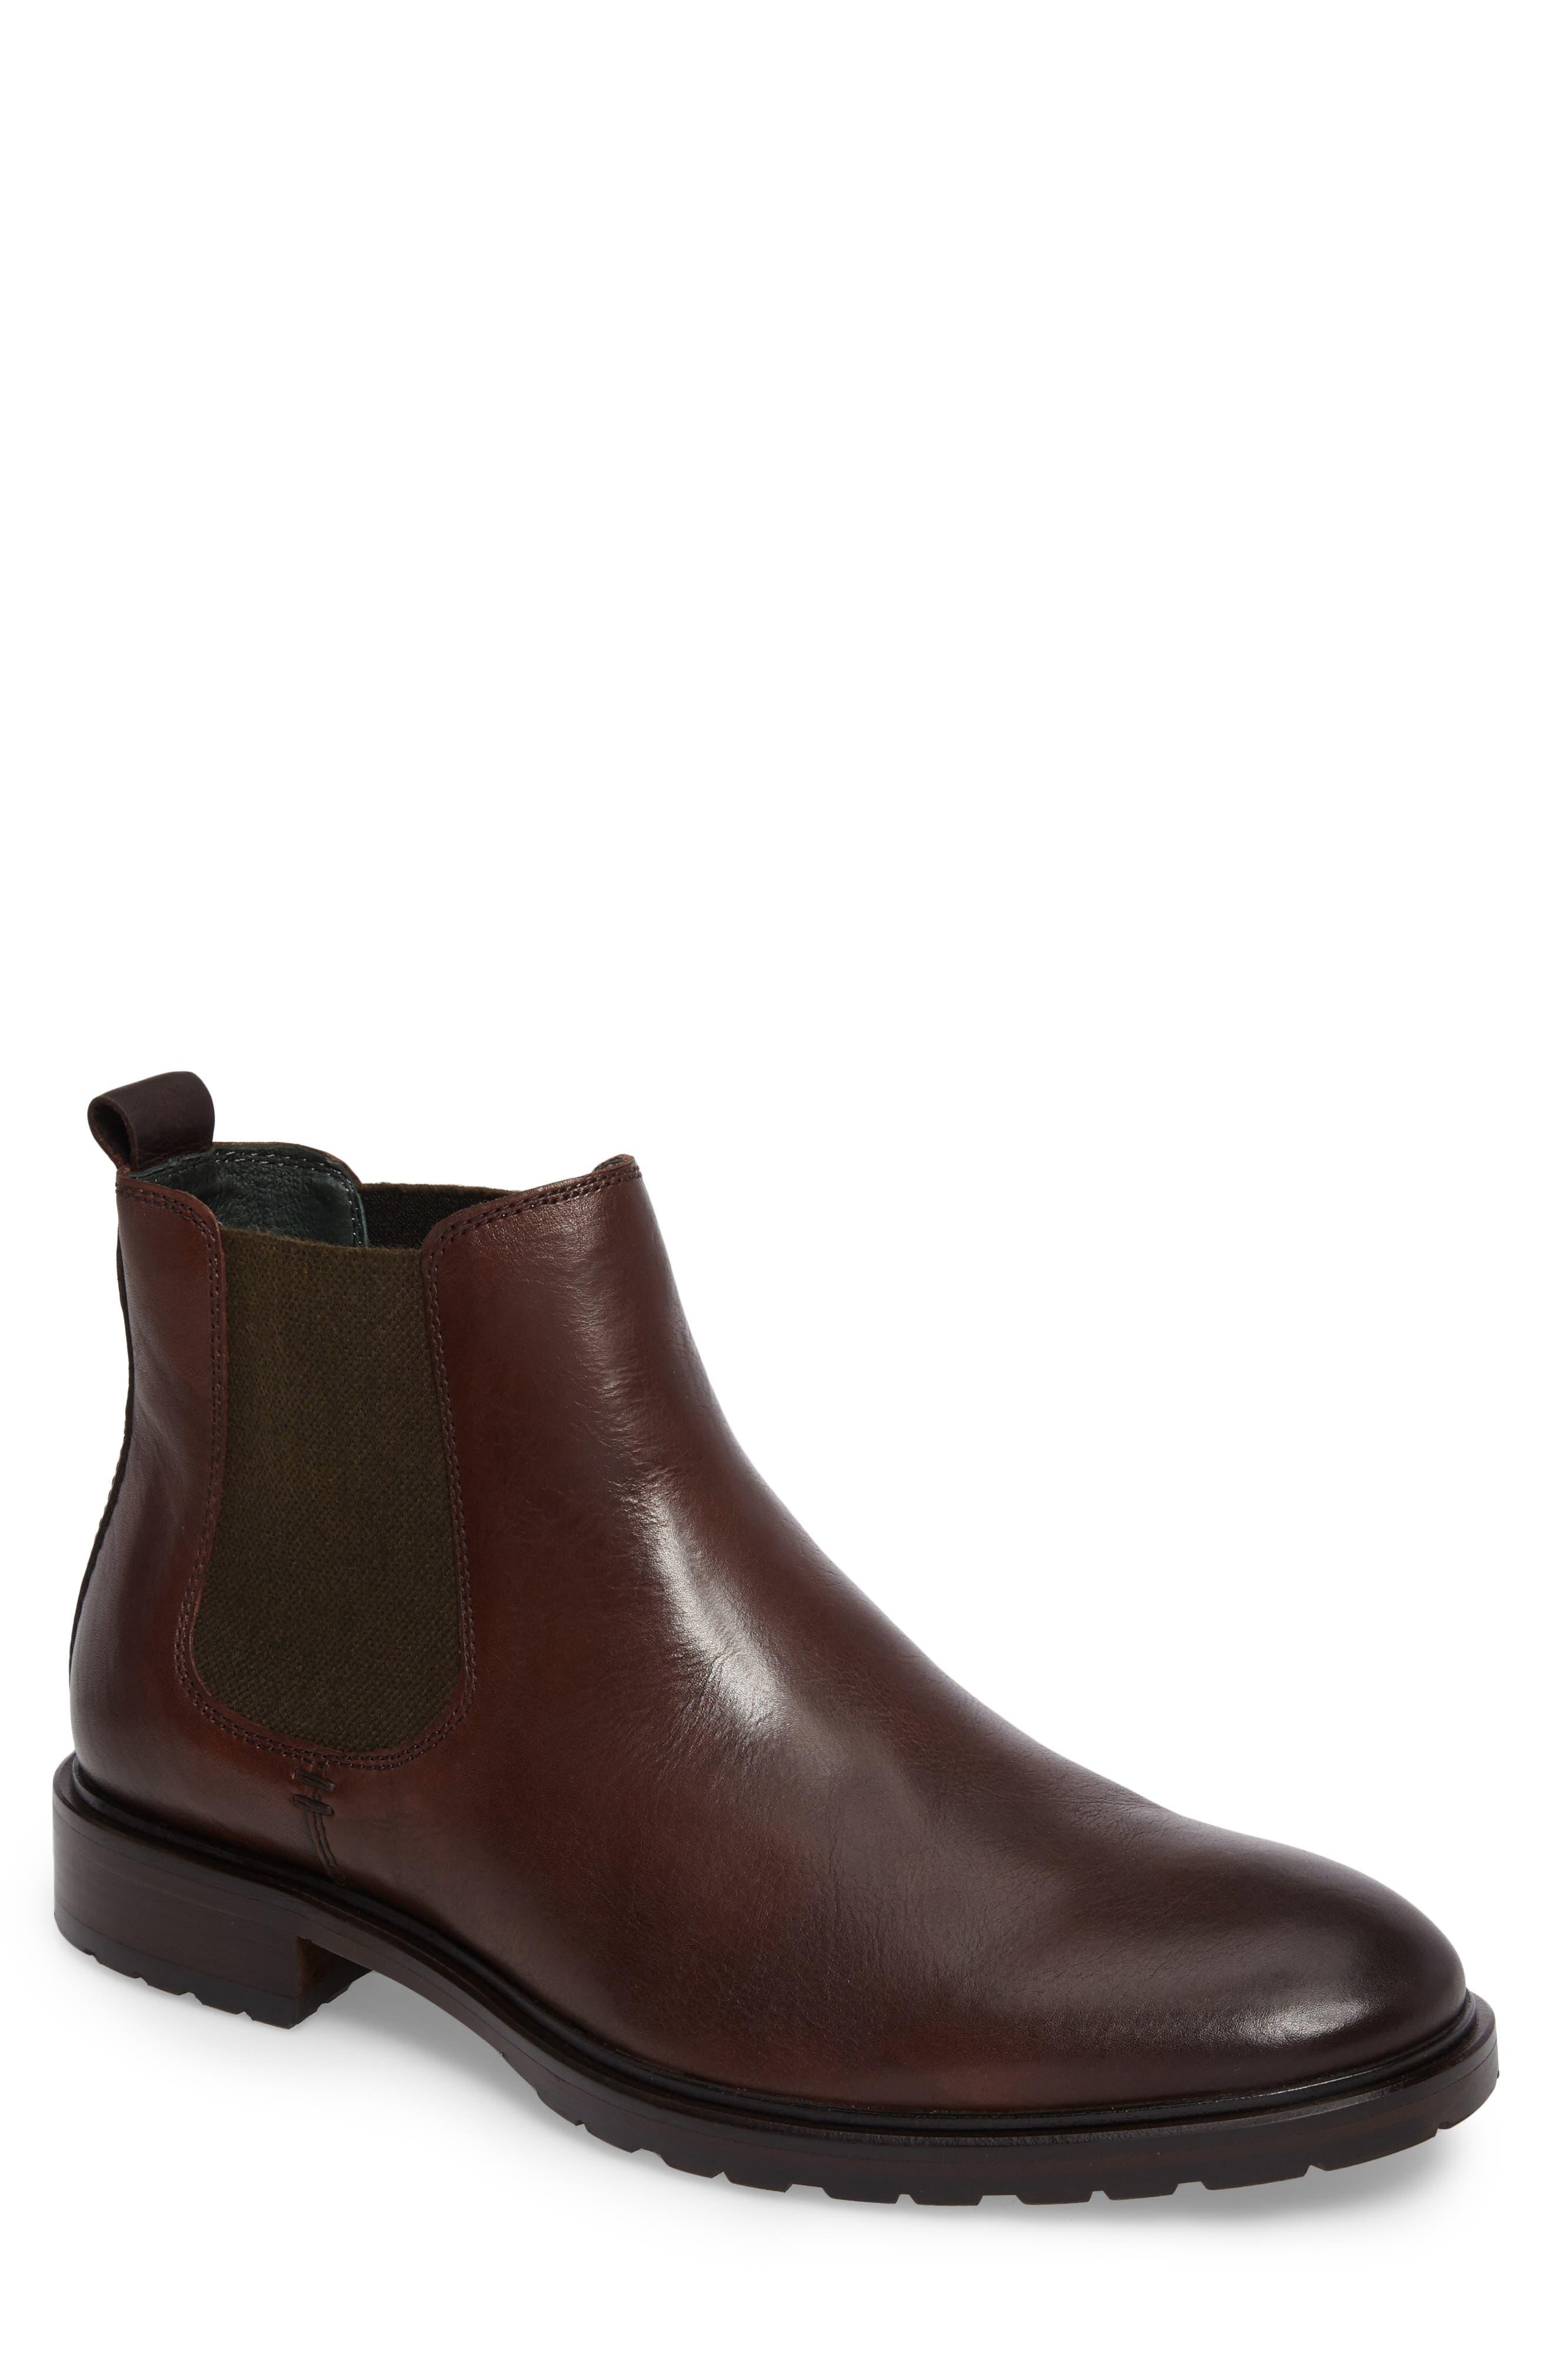 Myles Chelsea Boot,                             Main thumbnail 1, color,                             Mahogany Leather